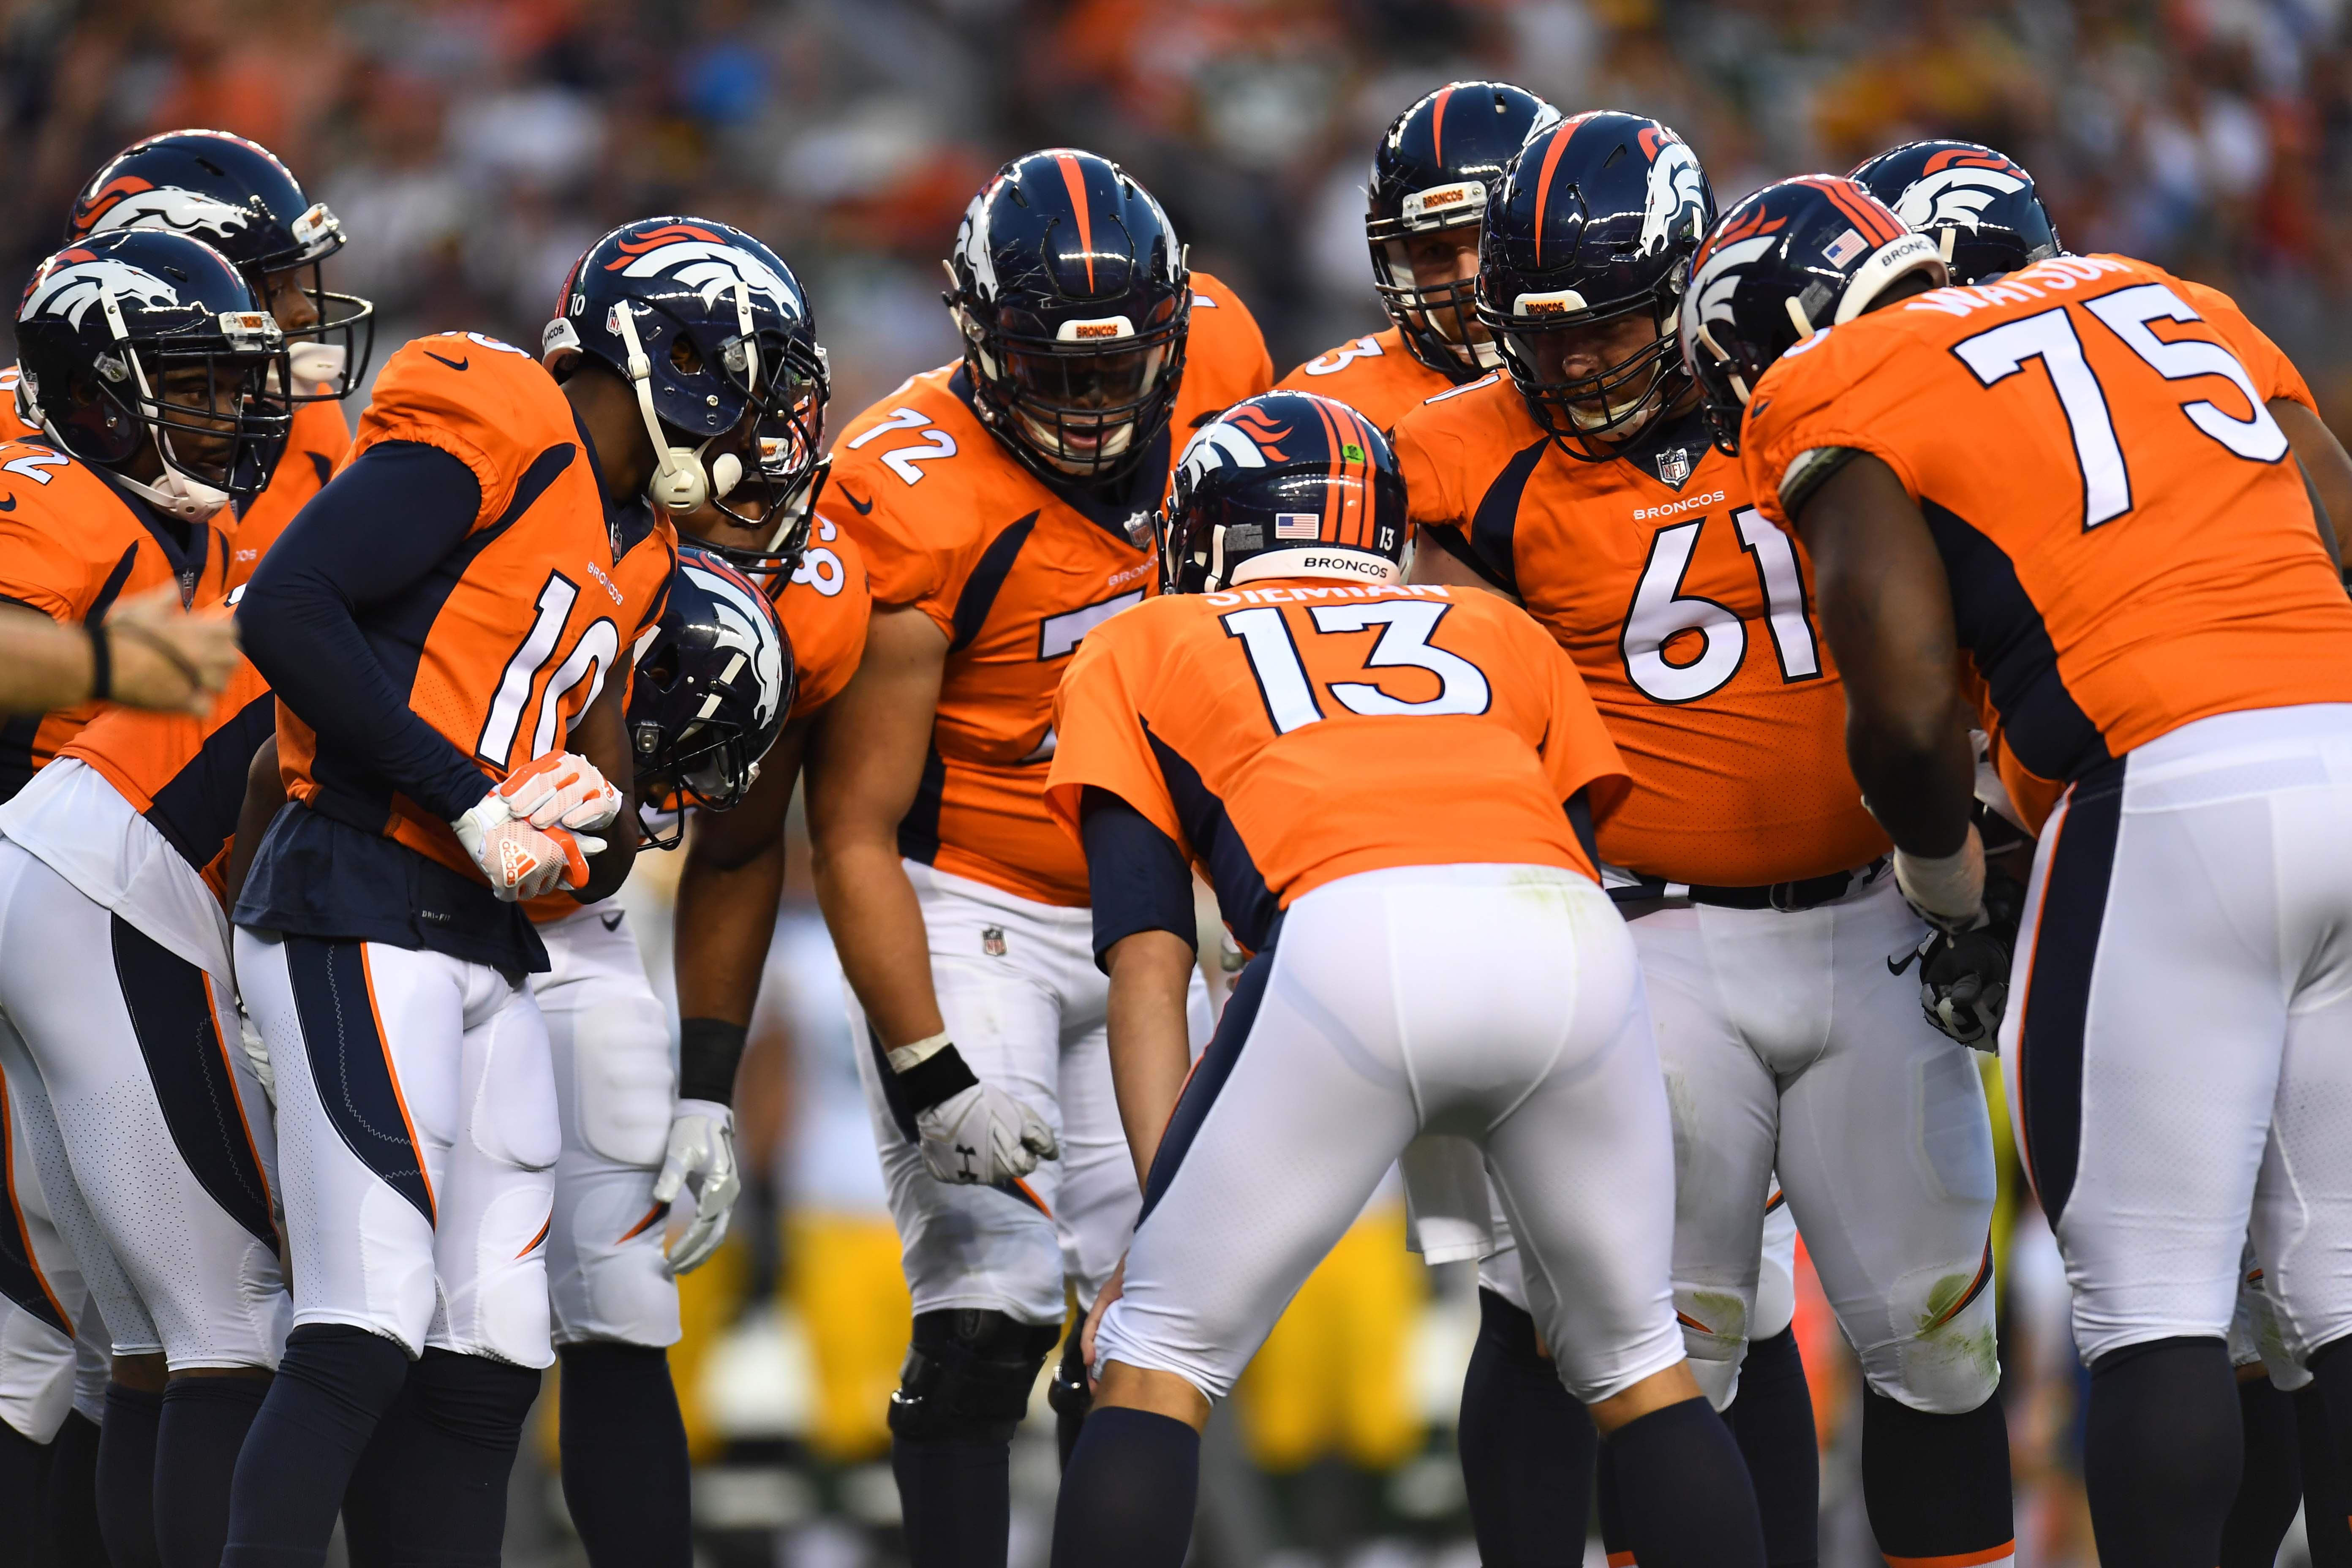 NFL: Green Bay Packers at Denver Broncos